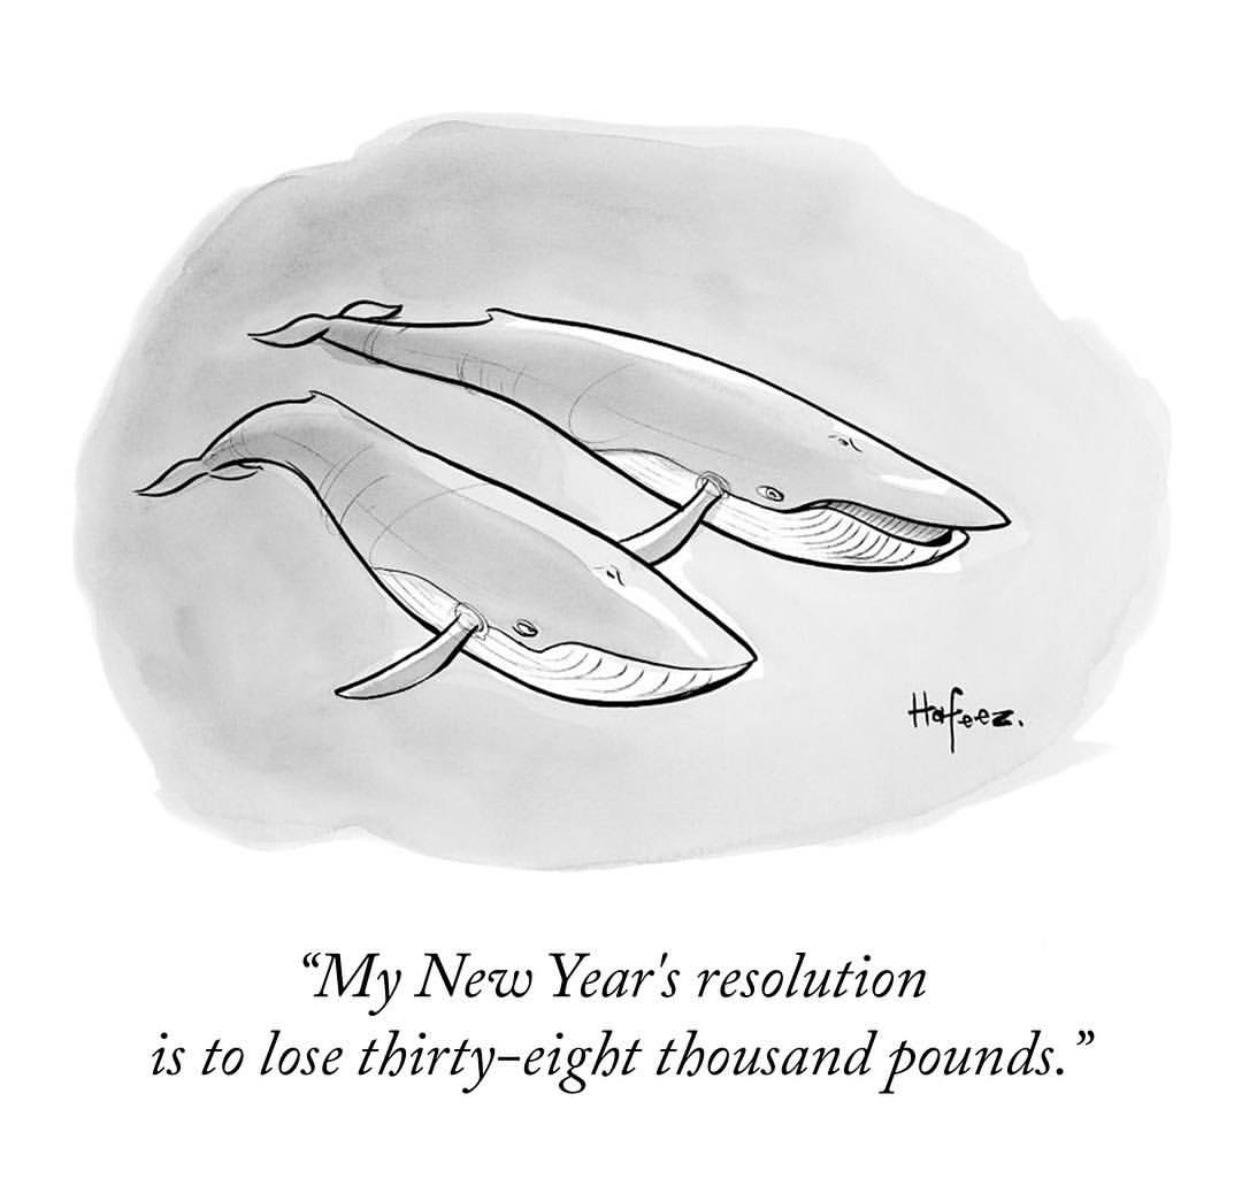 Source  The New Yorker Cartoons , Kaaram Hafeez, 2015